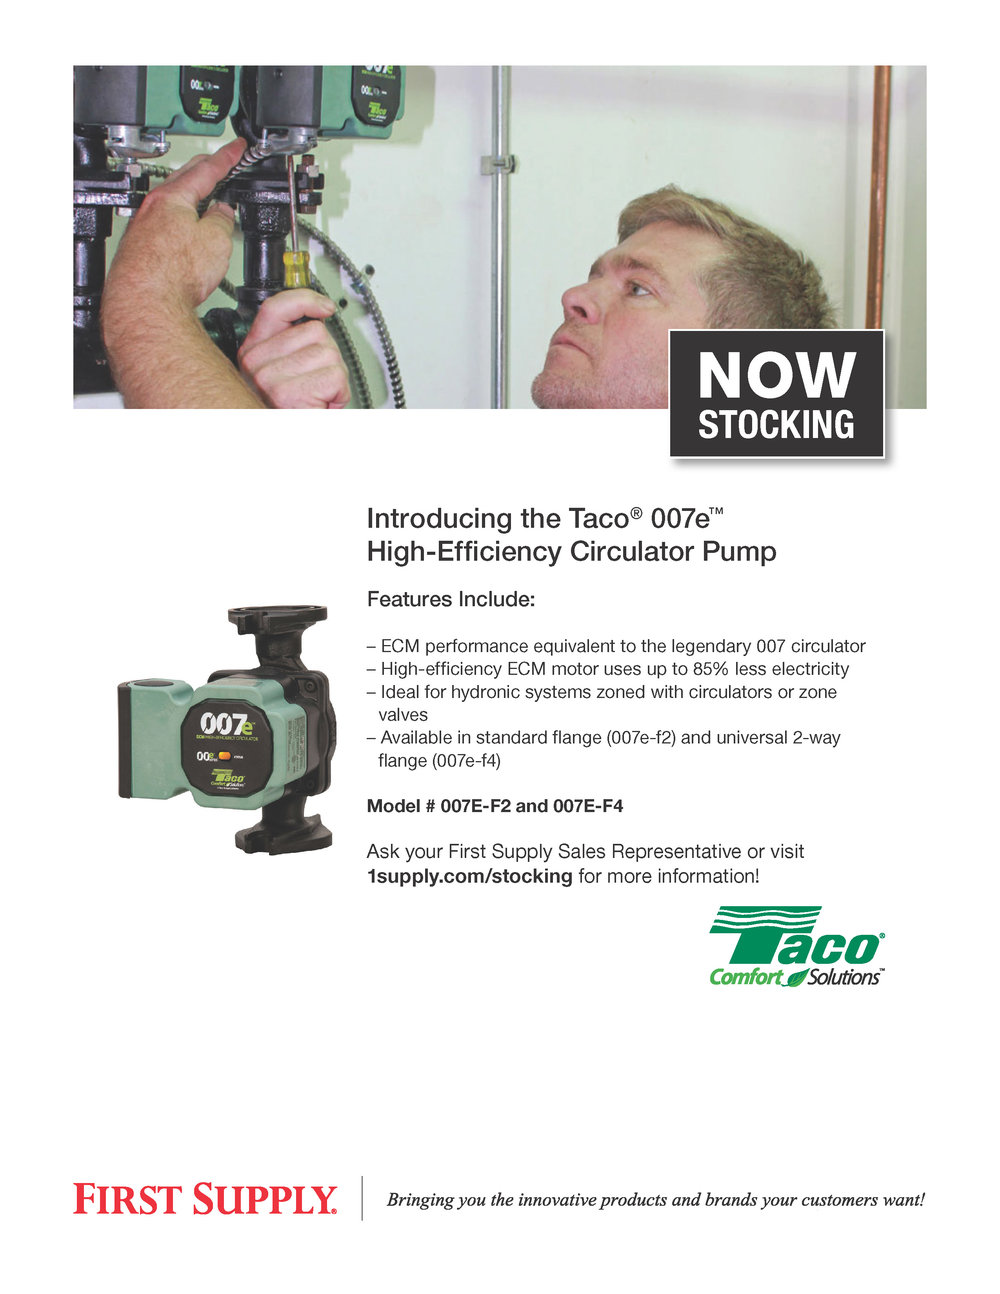 Taco 007e High-Efficiency Circulator Pump [ download pdf ]